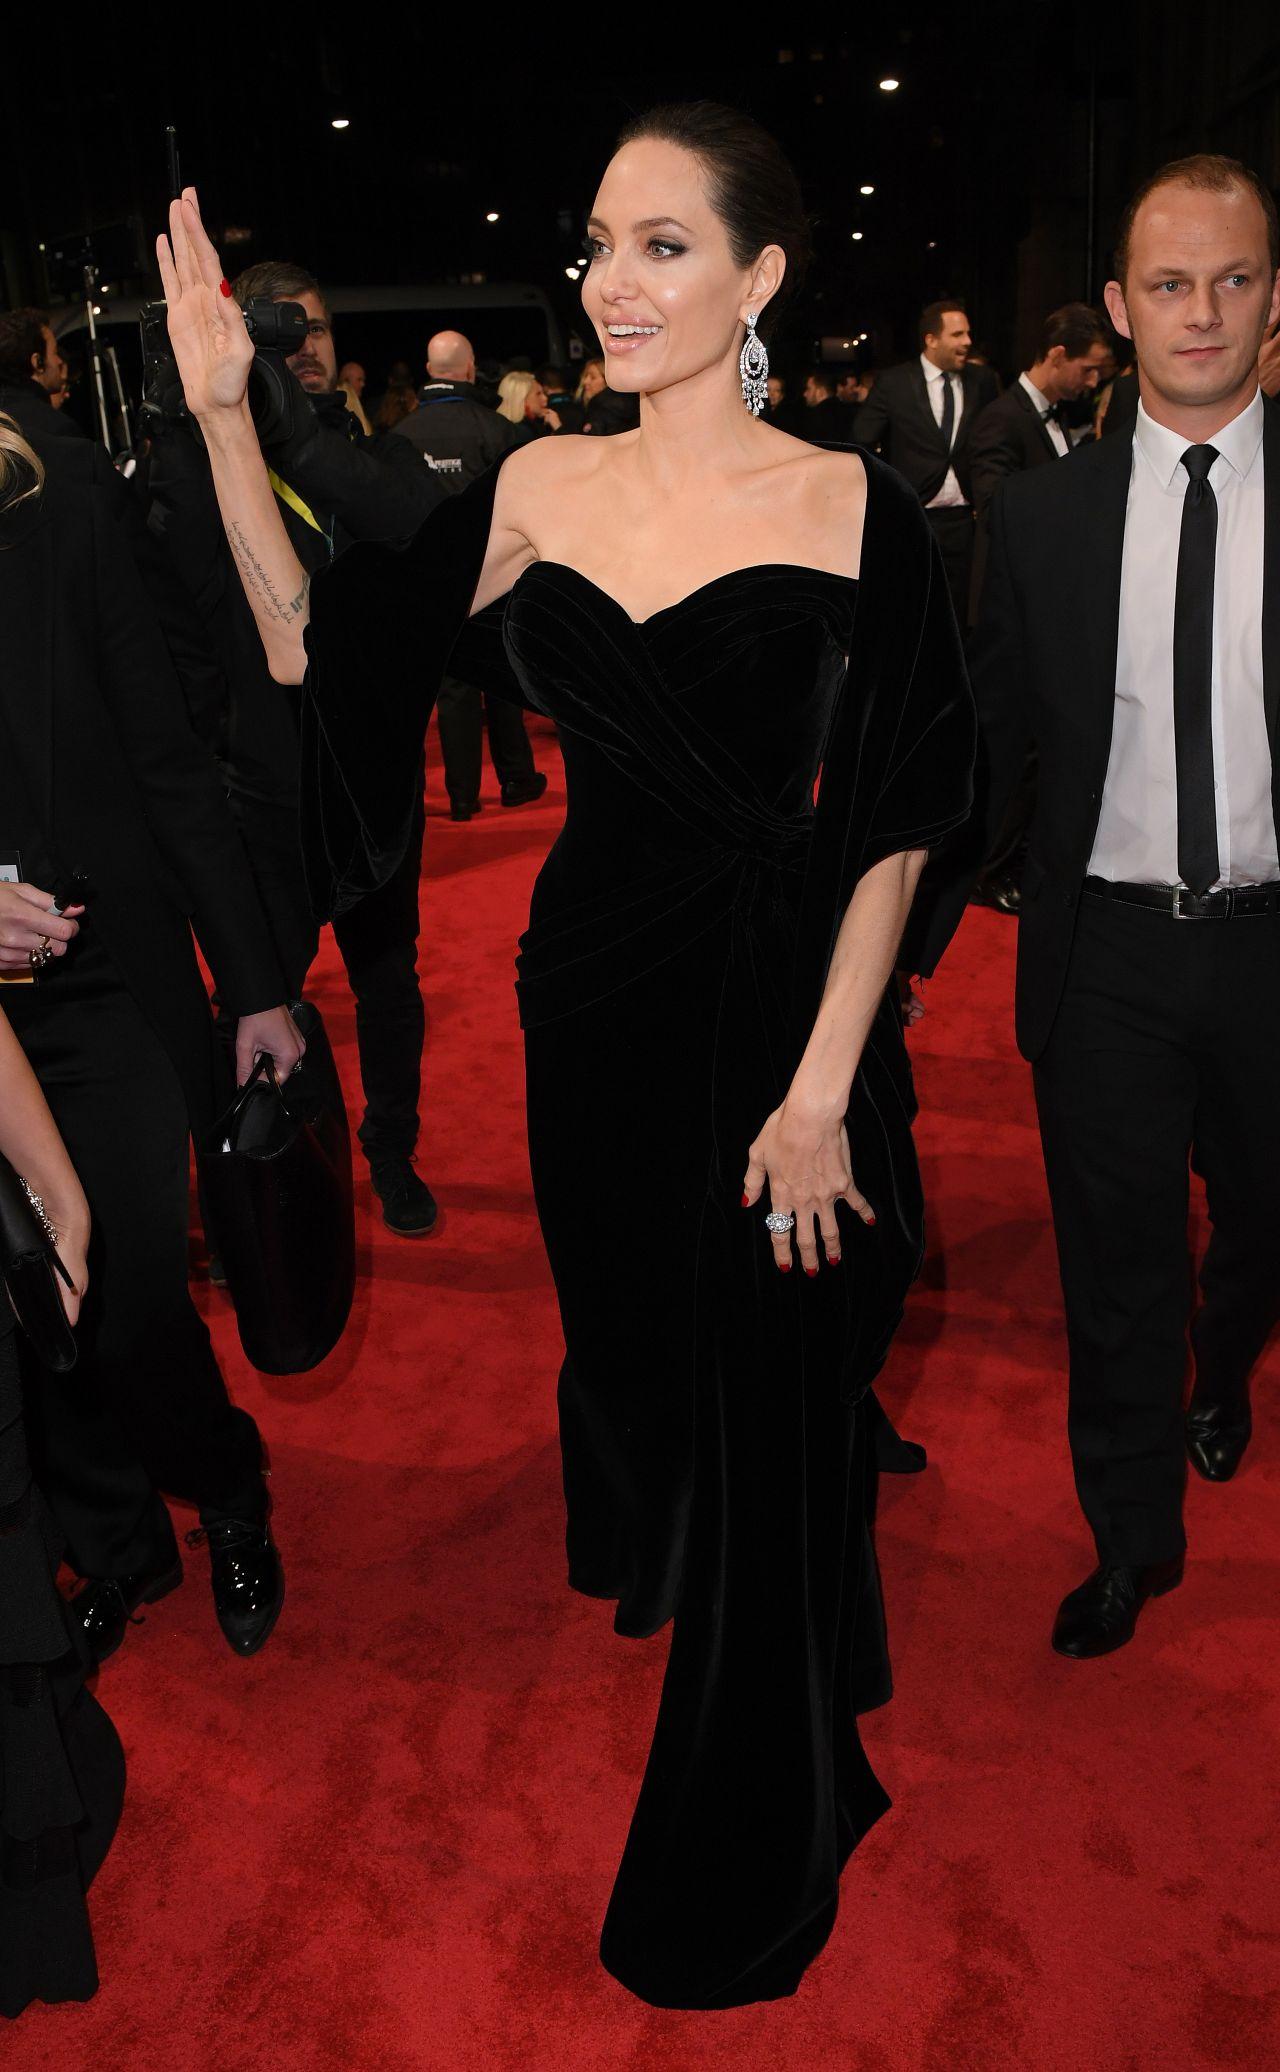 BAFTA 2018 sees Angelina Jolie drop jaws in tight black